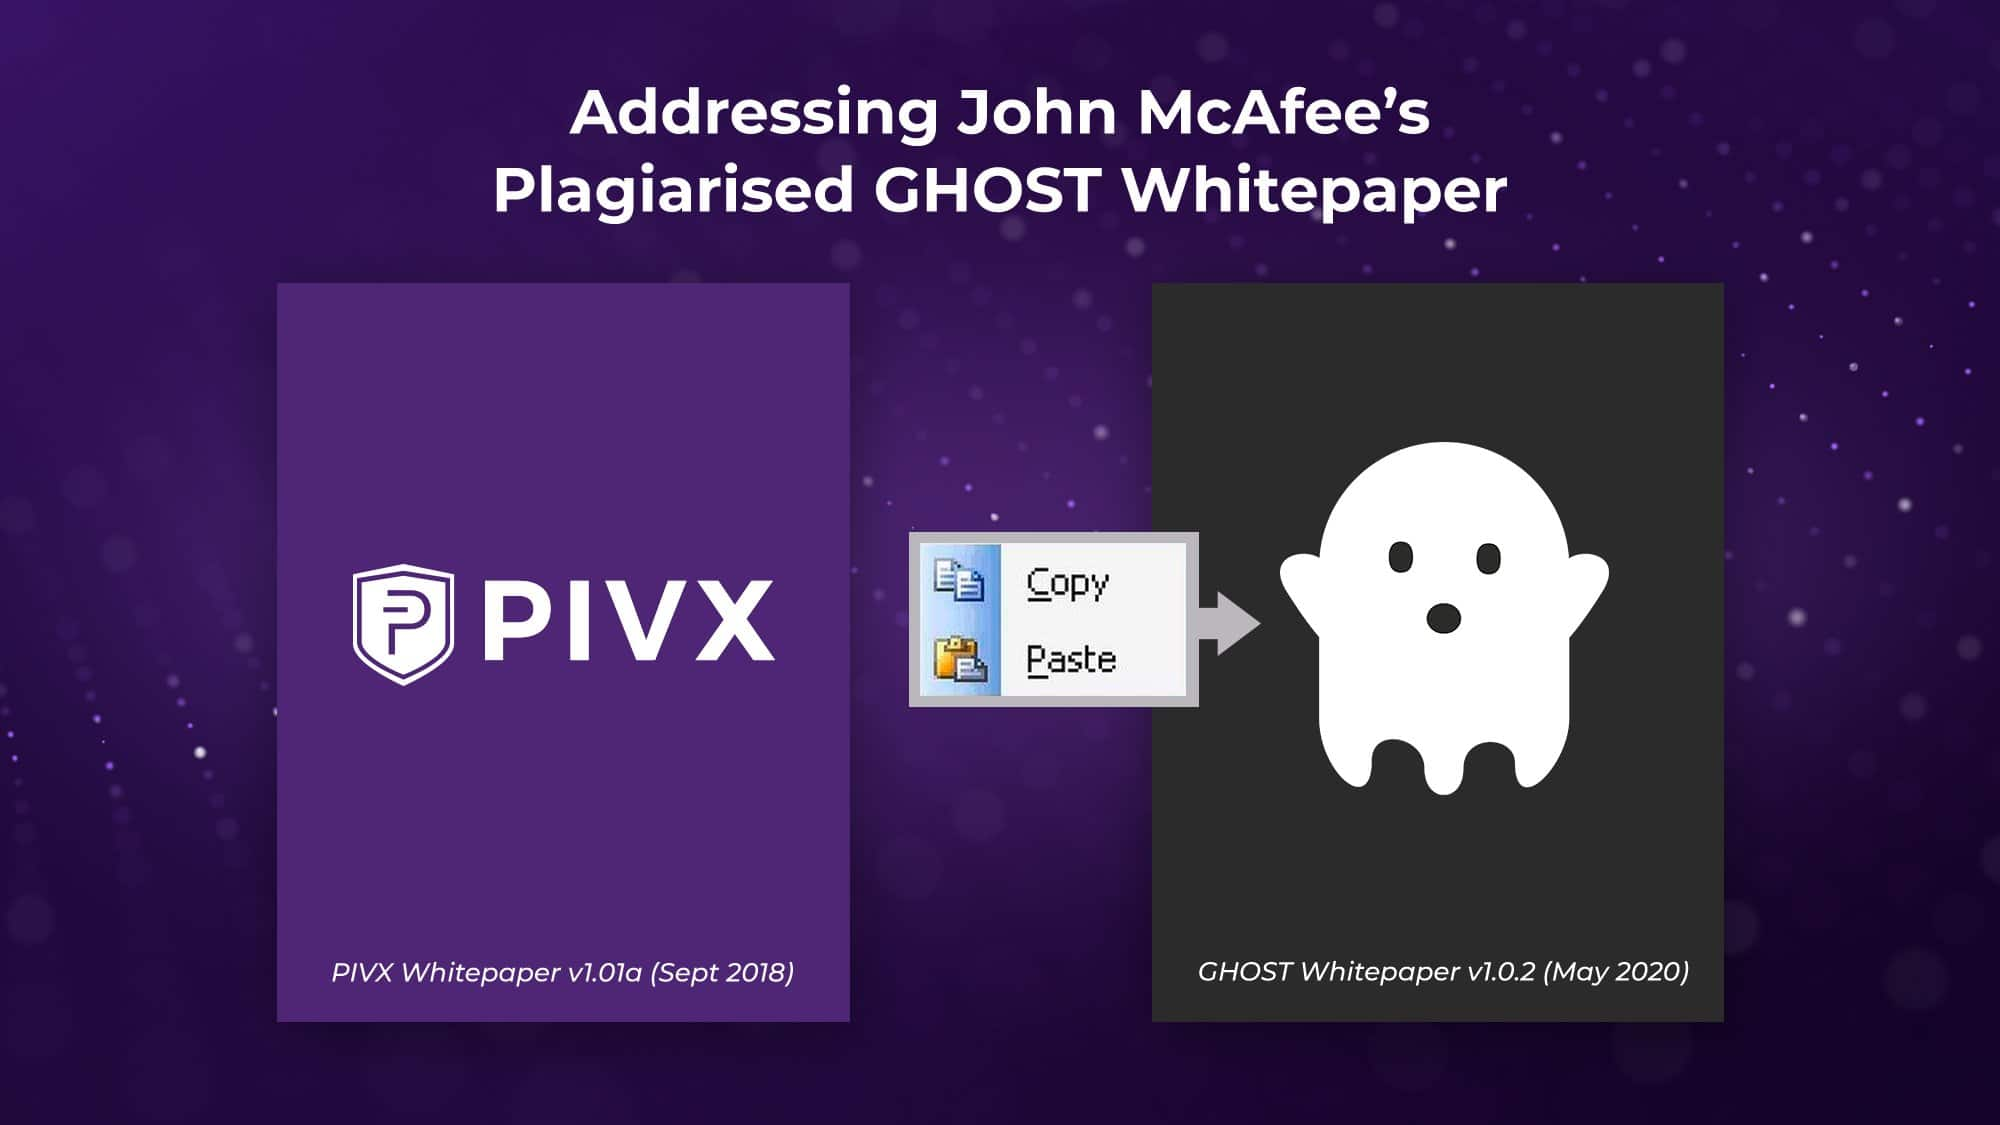 pivx vs ghost